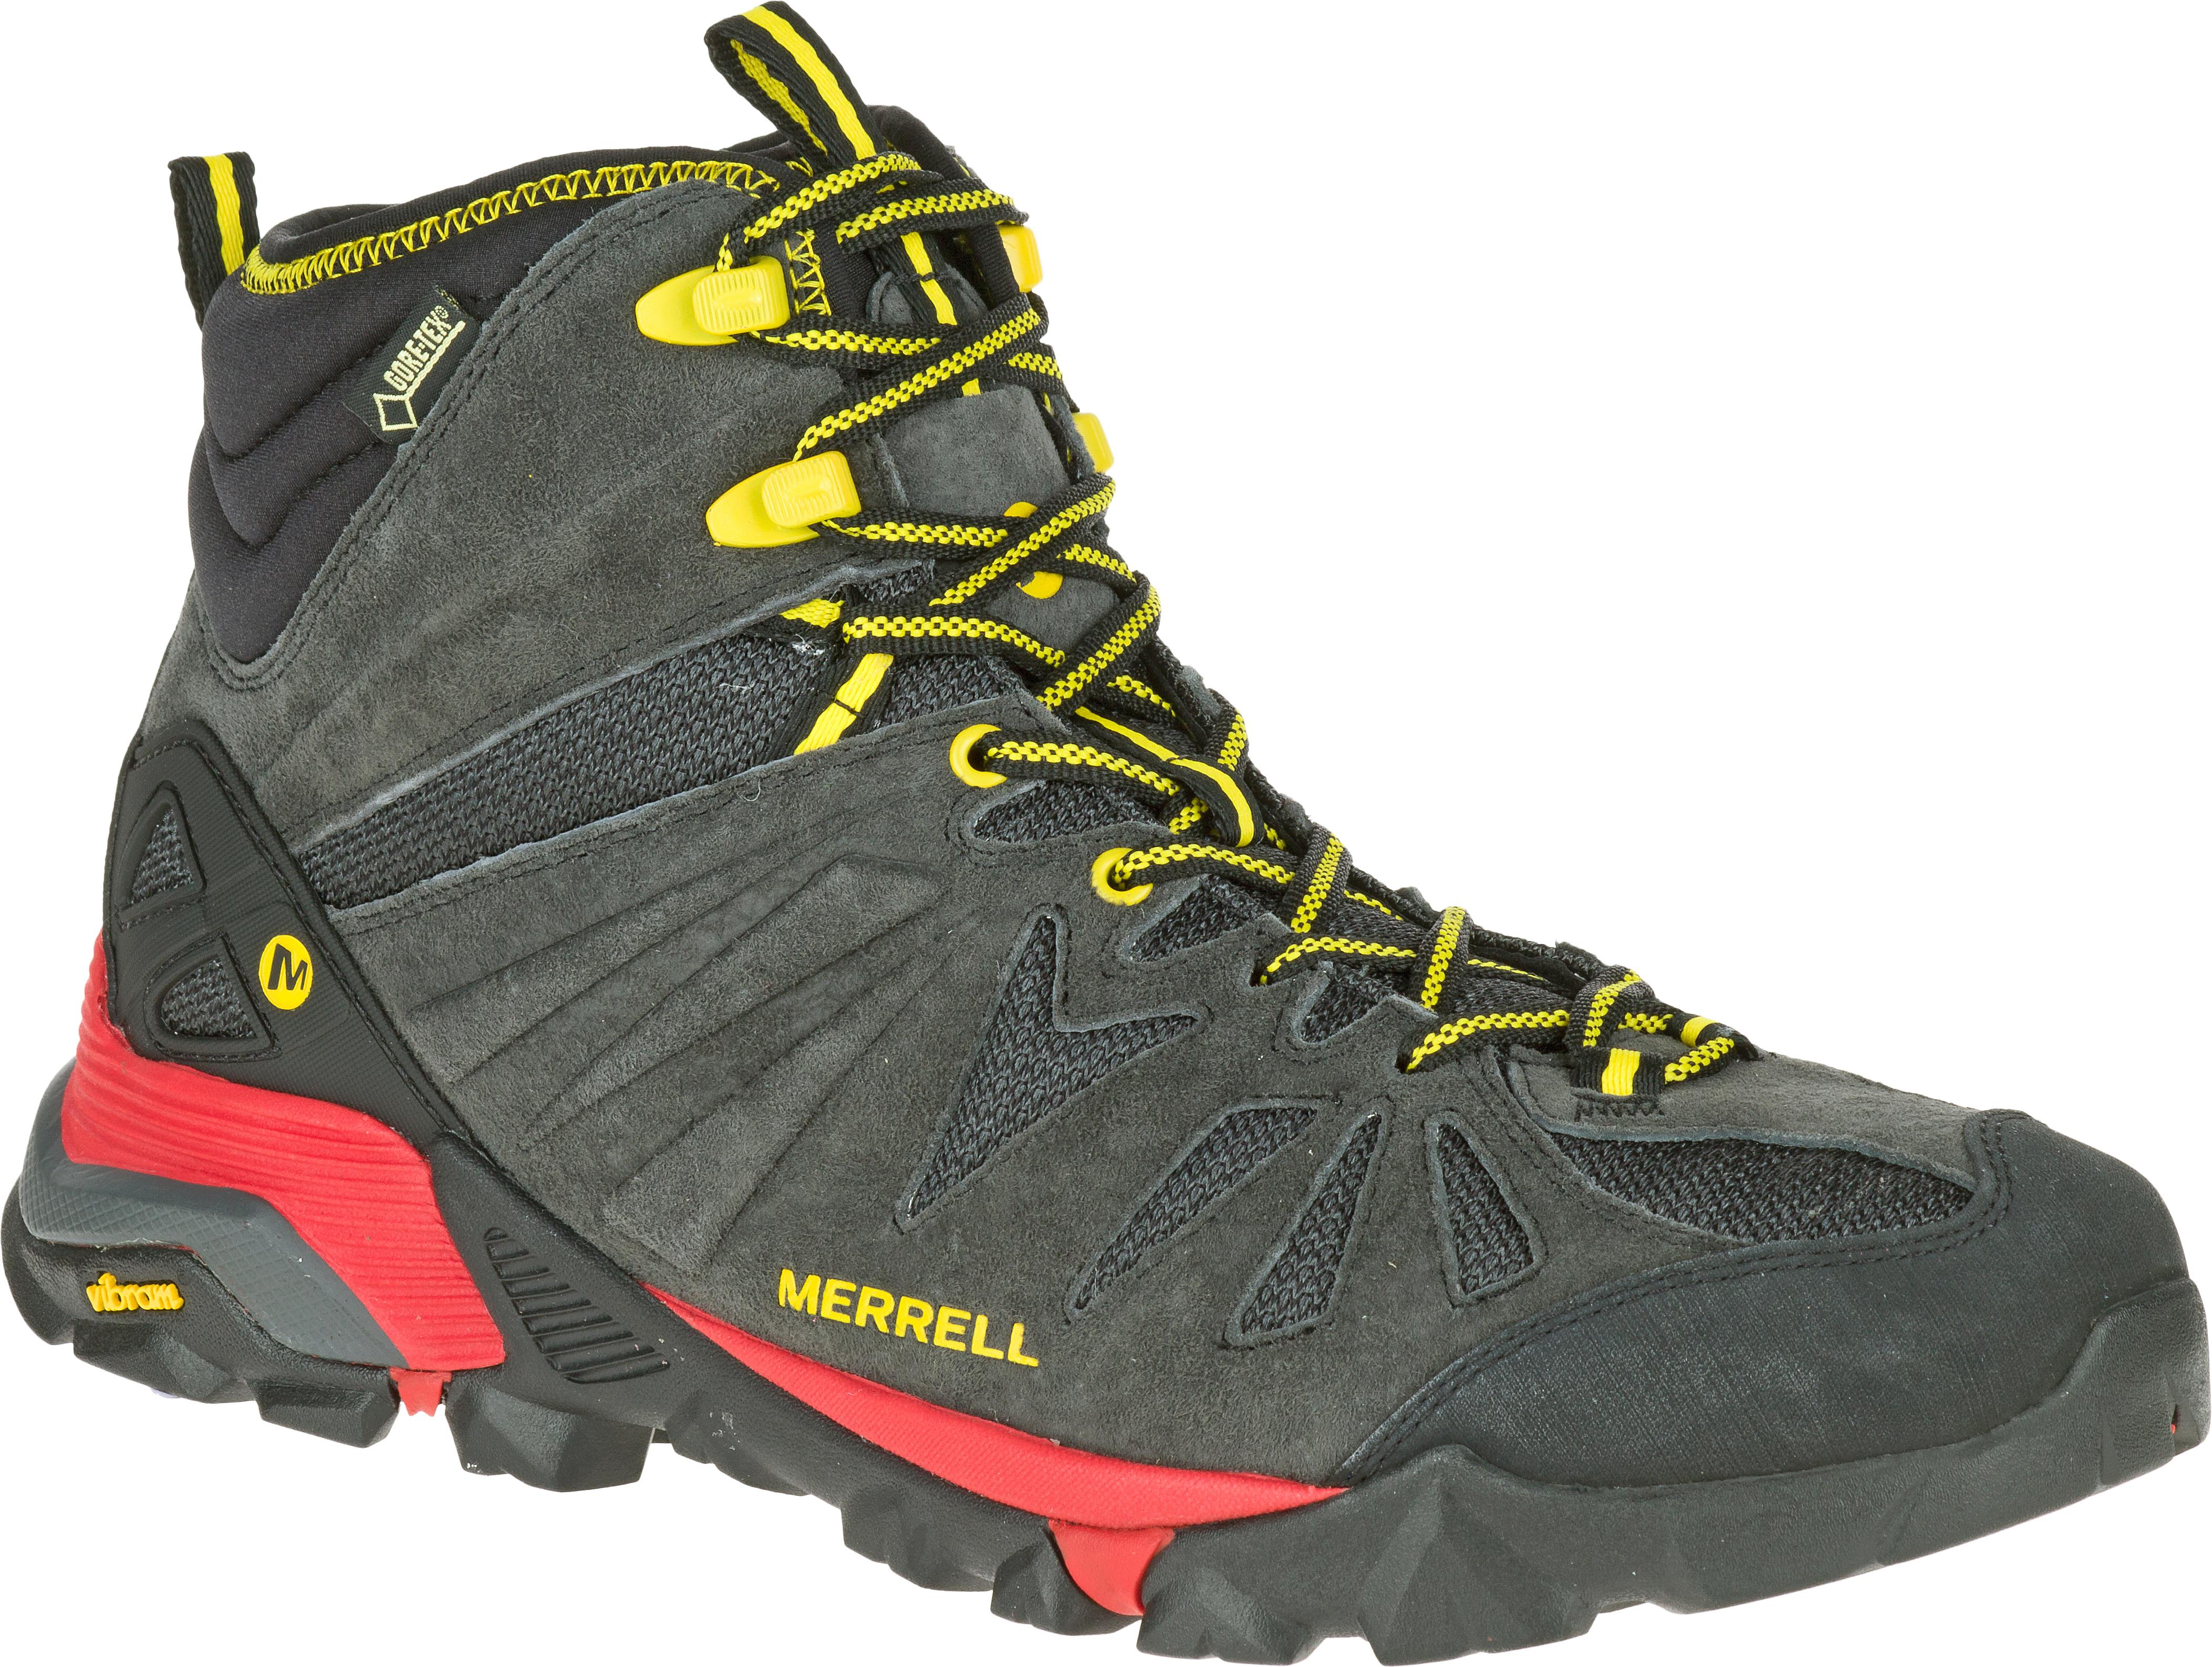 Merrell Capra Mid Gore-Tex 35329 EUR 42